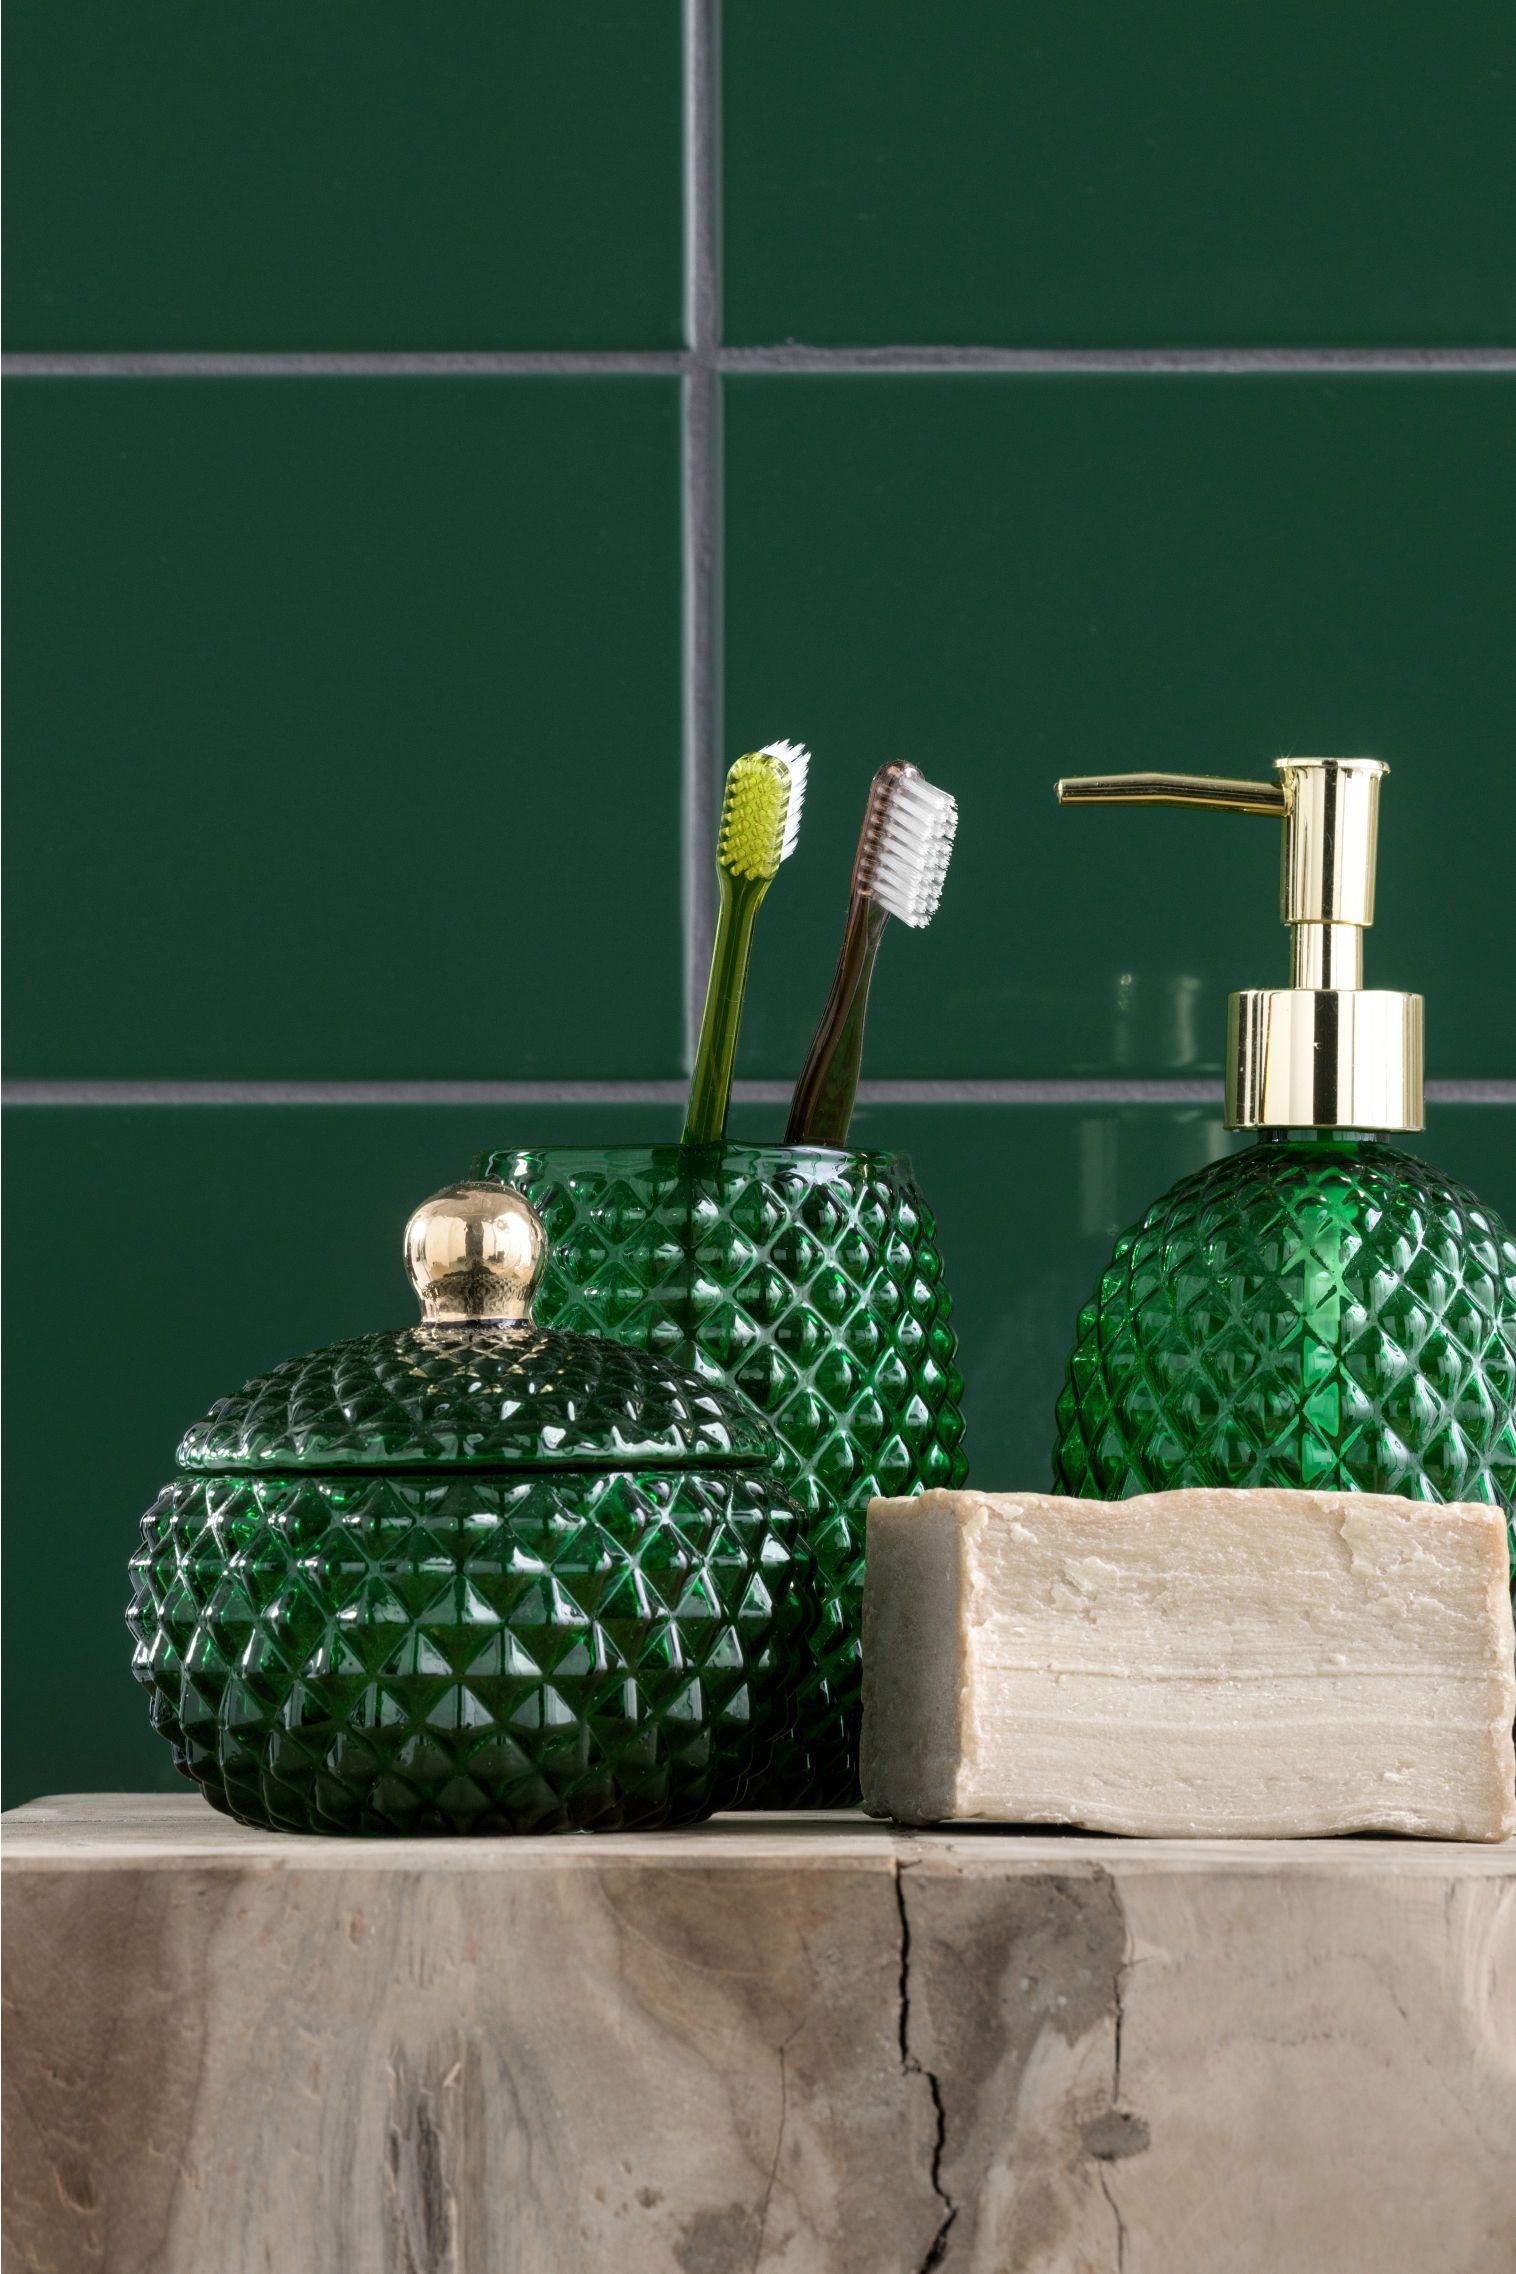 Pdp Green Bathroom Accessories Glass Soap Dispenser Green Bathroom